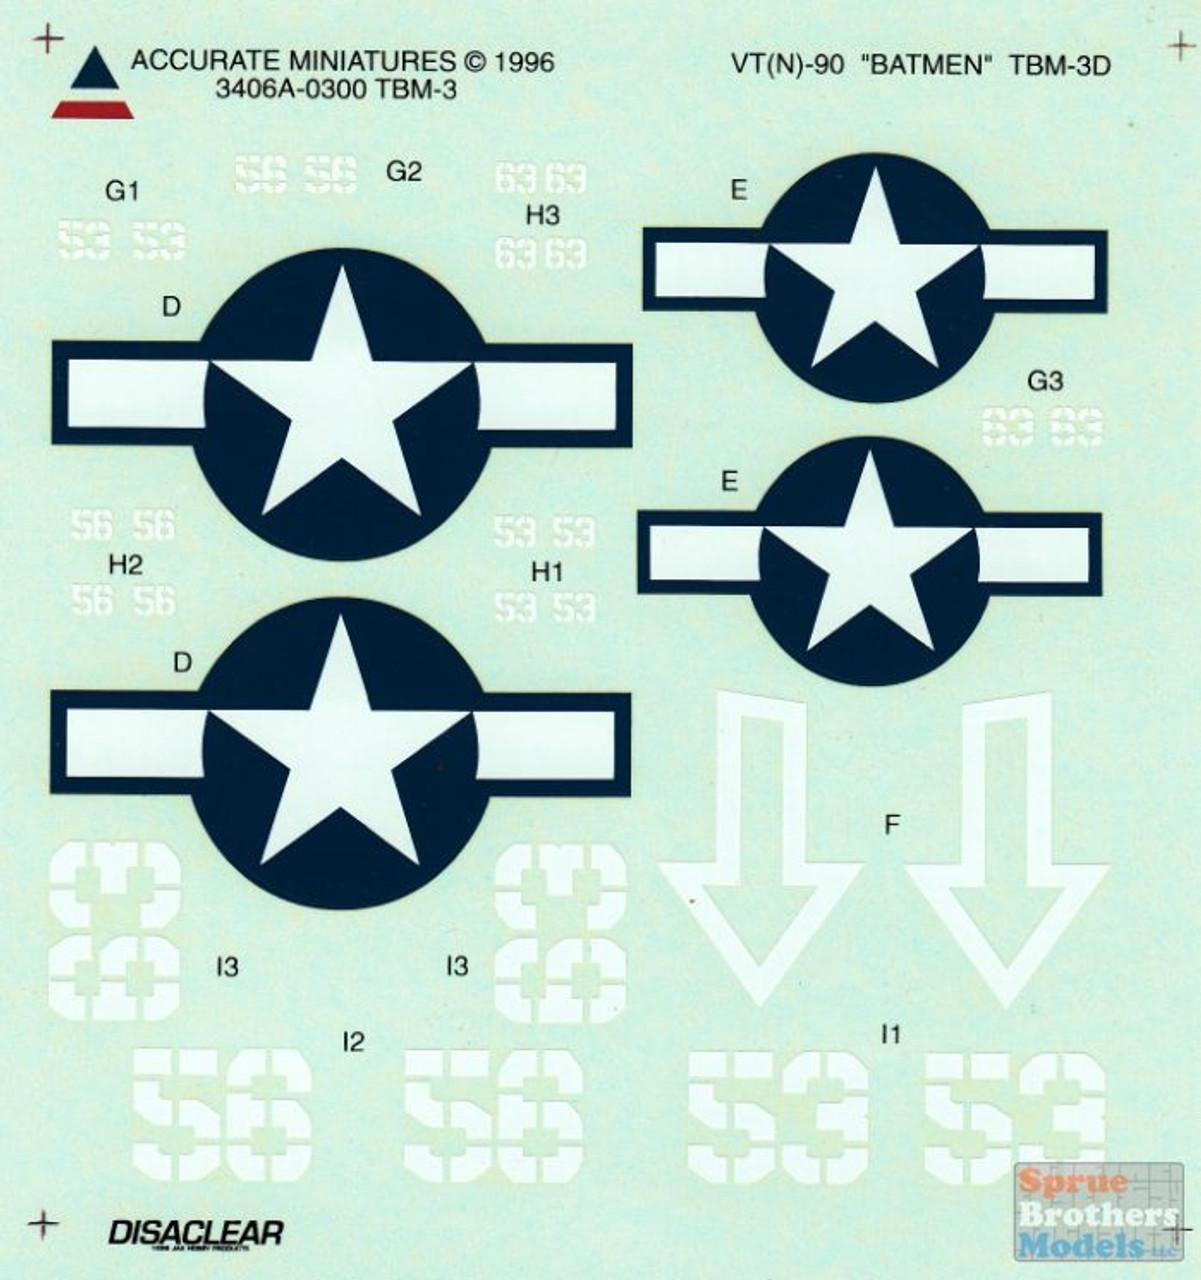 ACMD3406A 1:48 Accurate Miniatures Decals - TBM-3 Avenger VT(N)-90 Batmen